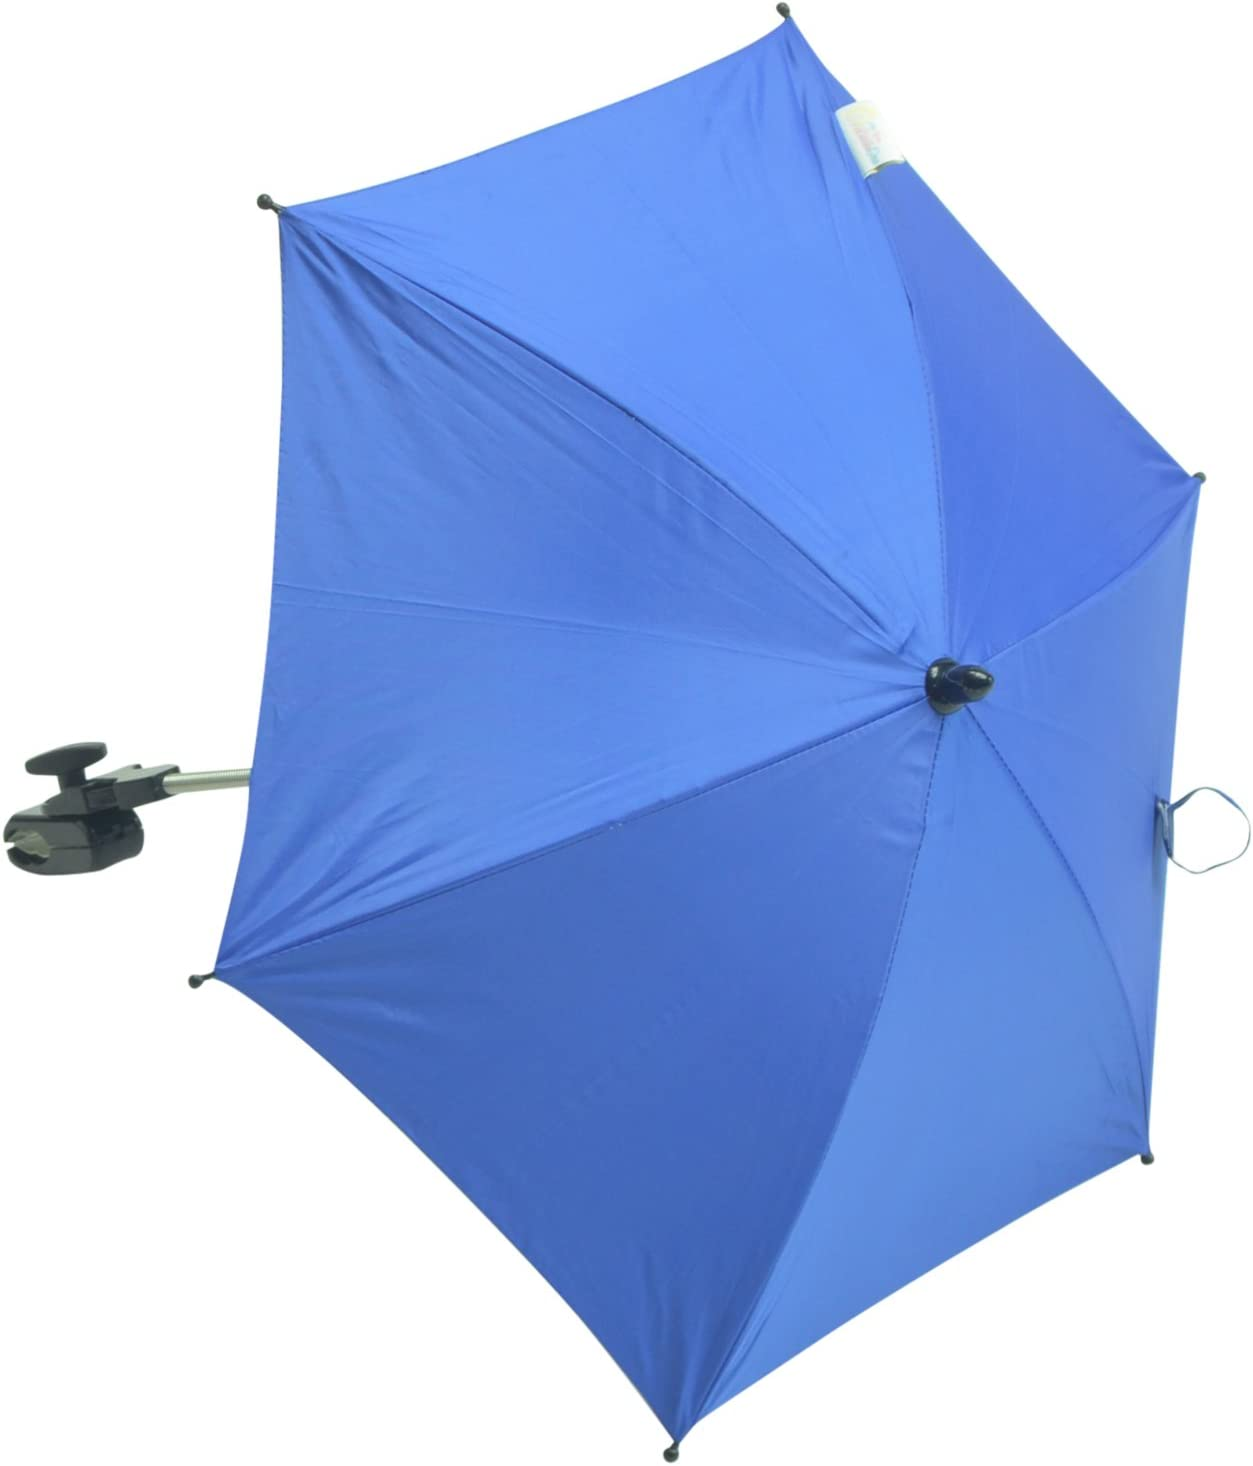 For-your-Little-One parasol Compatible con bebe confort Loola, color azul